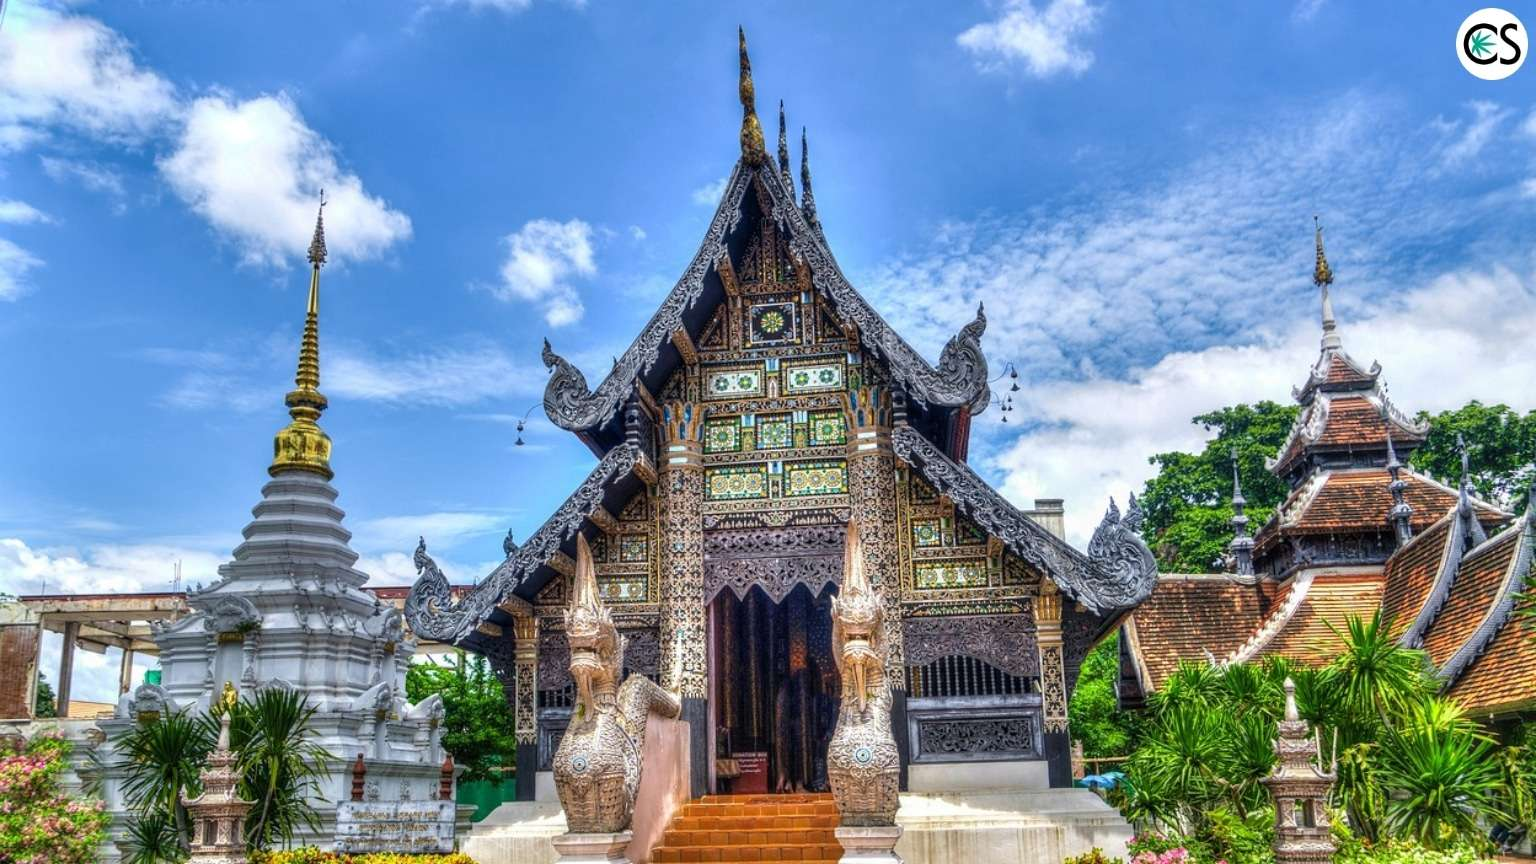 Thailand Legalizes CBD and Kratom - Green Zebra CBD Hemp Oil